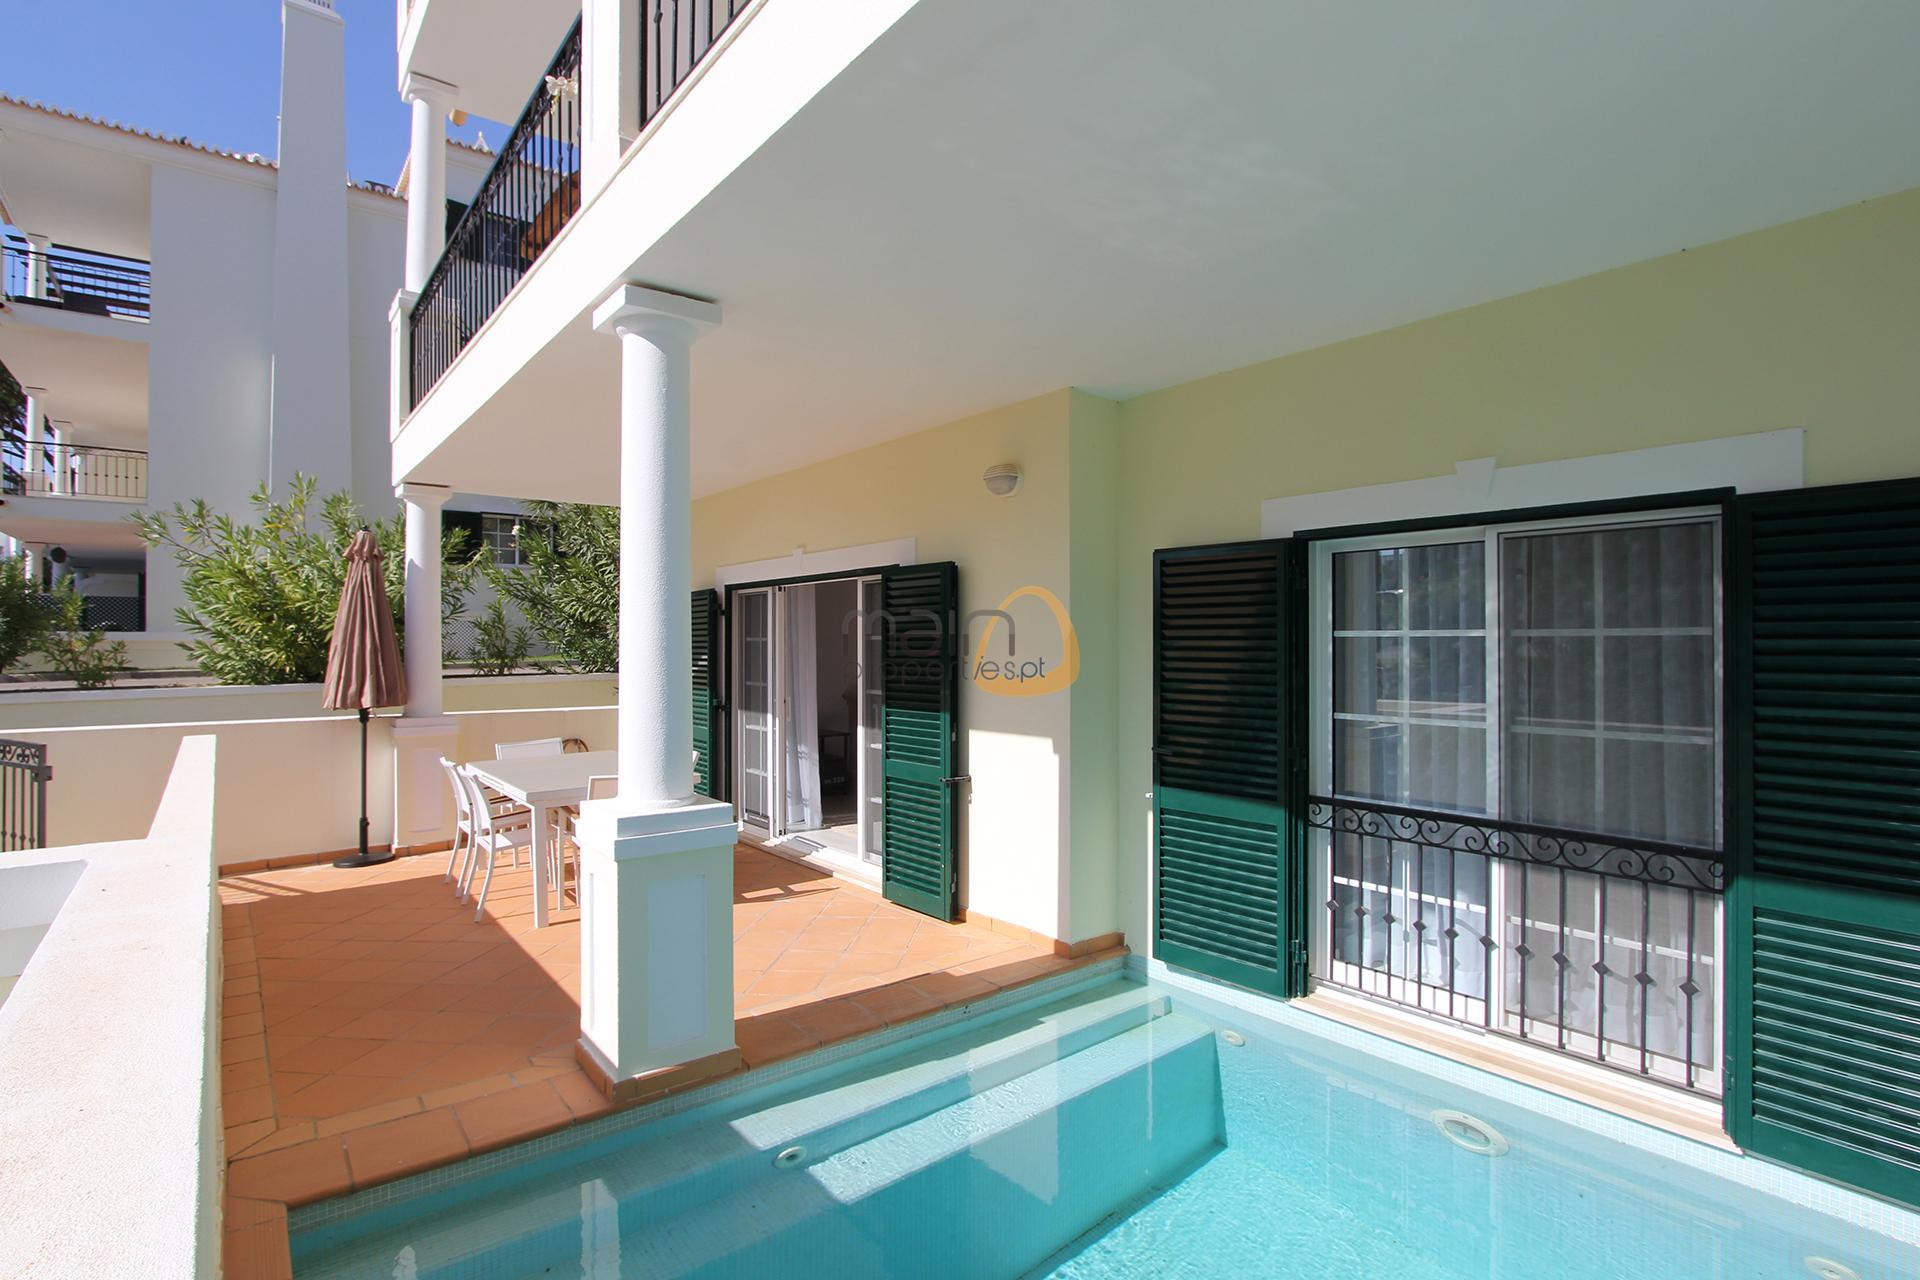 apartment-in-vale-do-lobo-algarve-golden-triangle-portugal-property-real-estate-mainproperties-mp134vdl-0